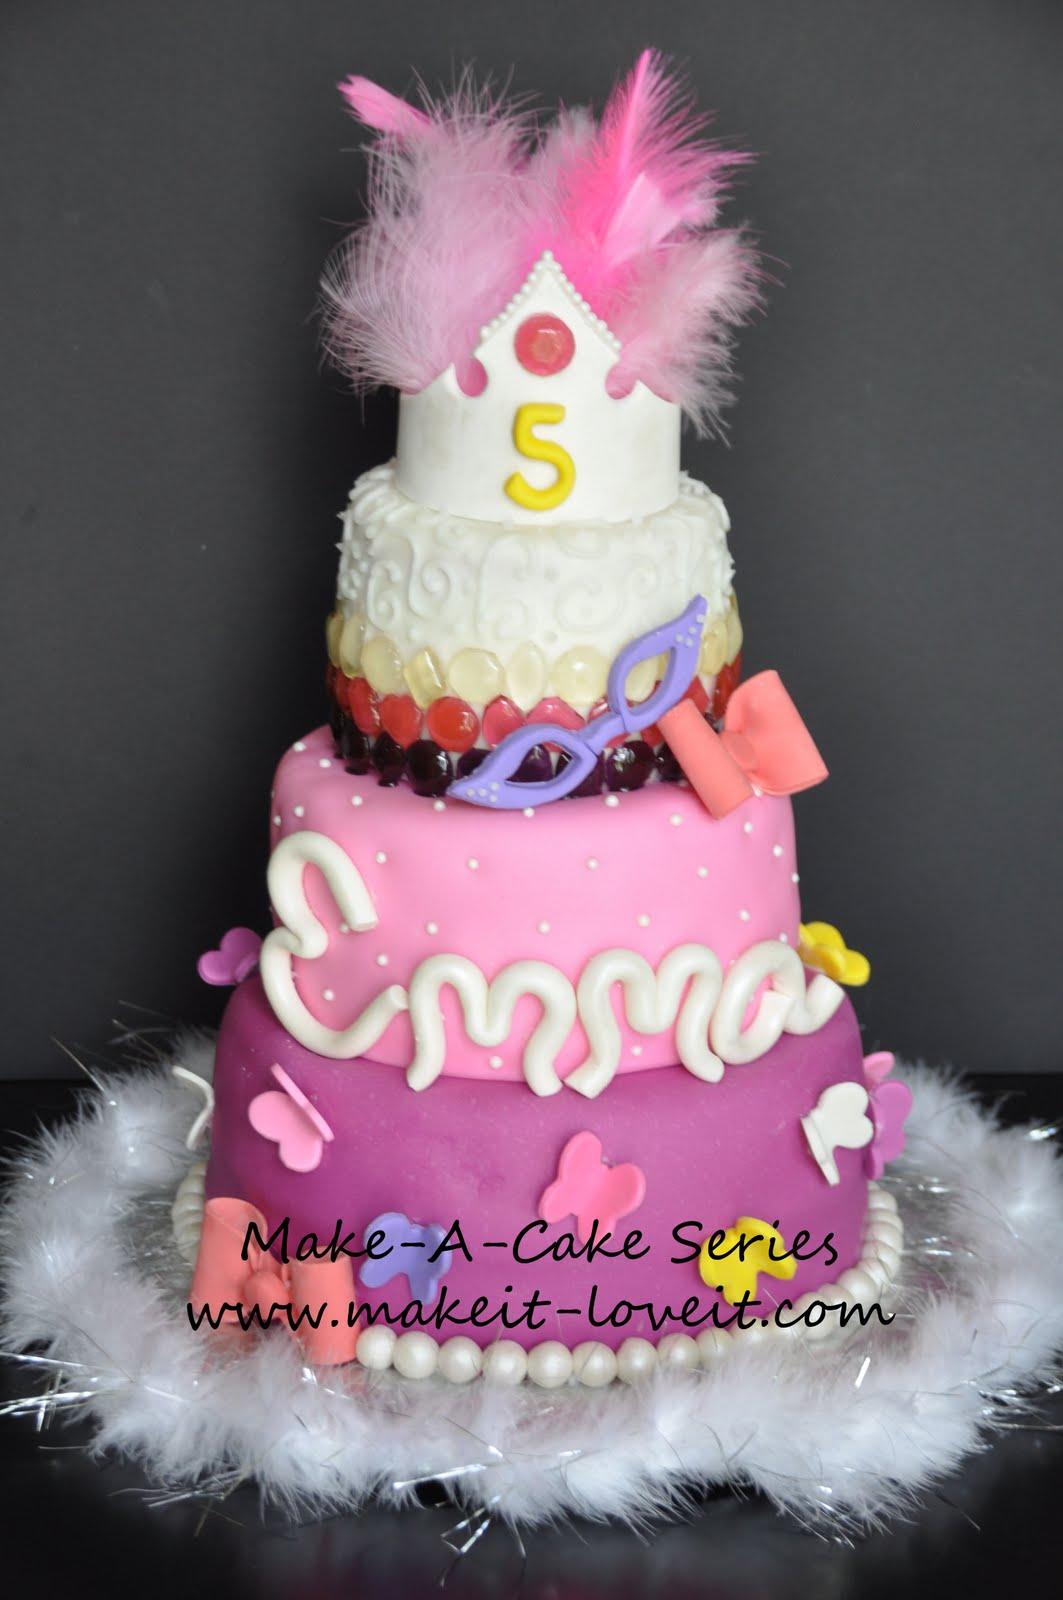 Make-a-Cake Series: Sugar Gems – Make It and Love It